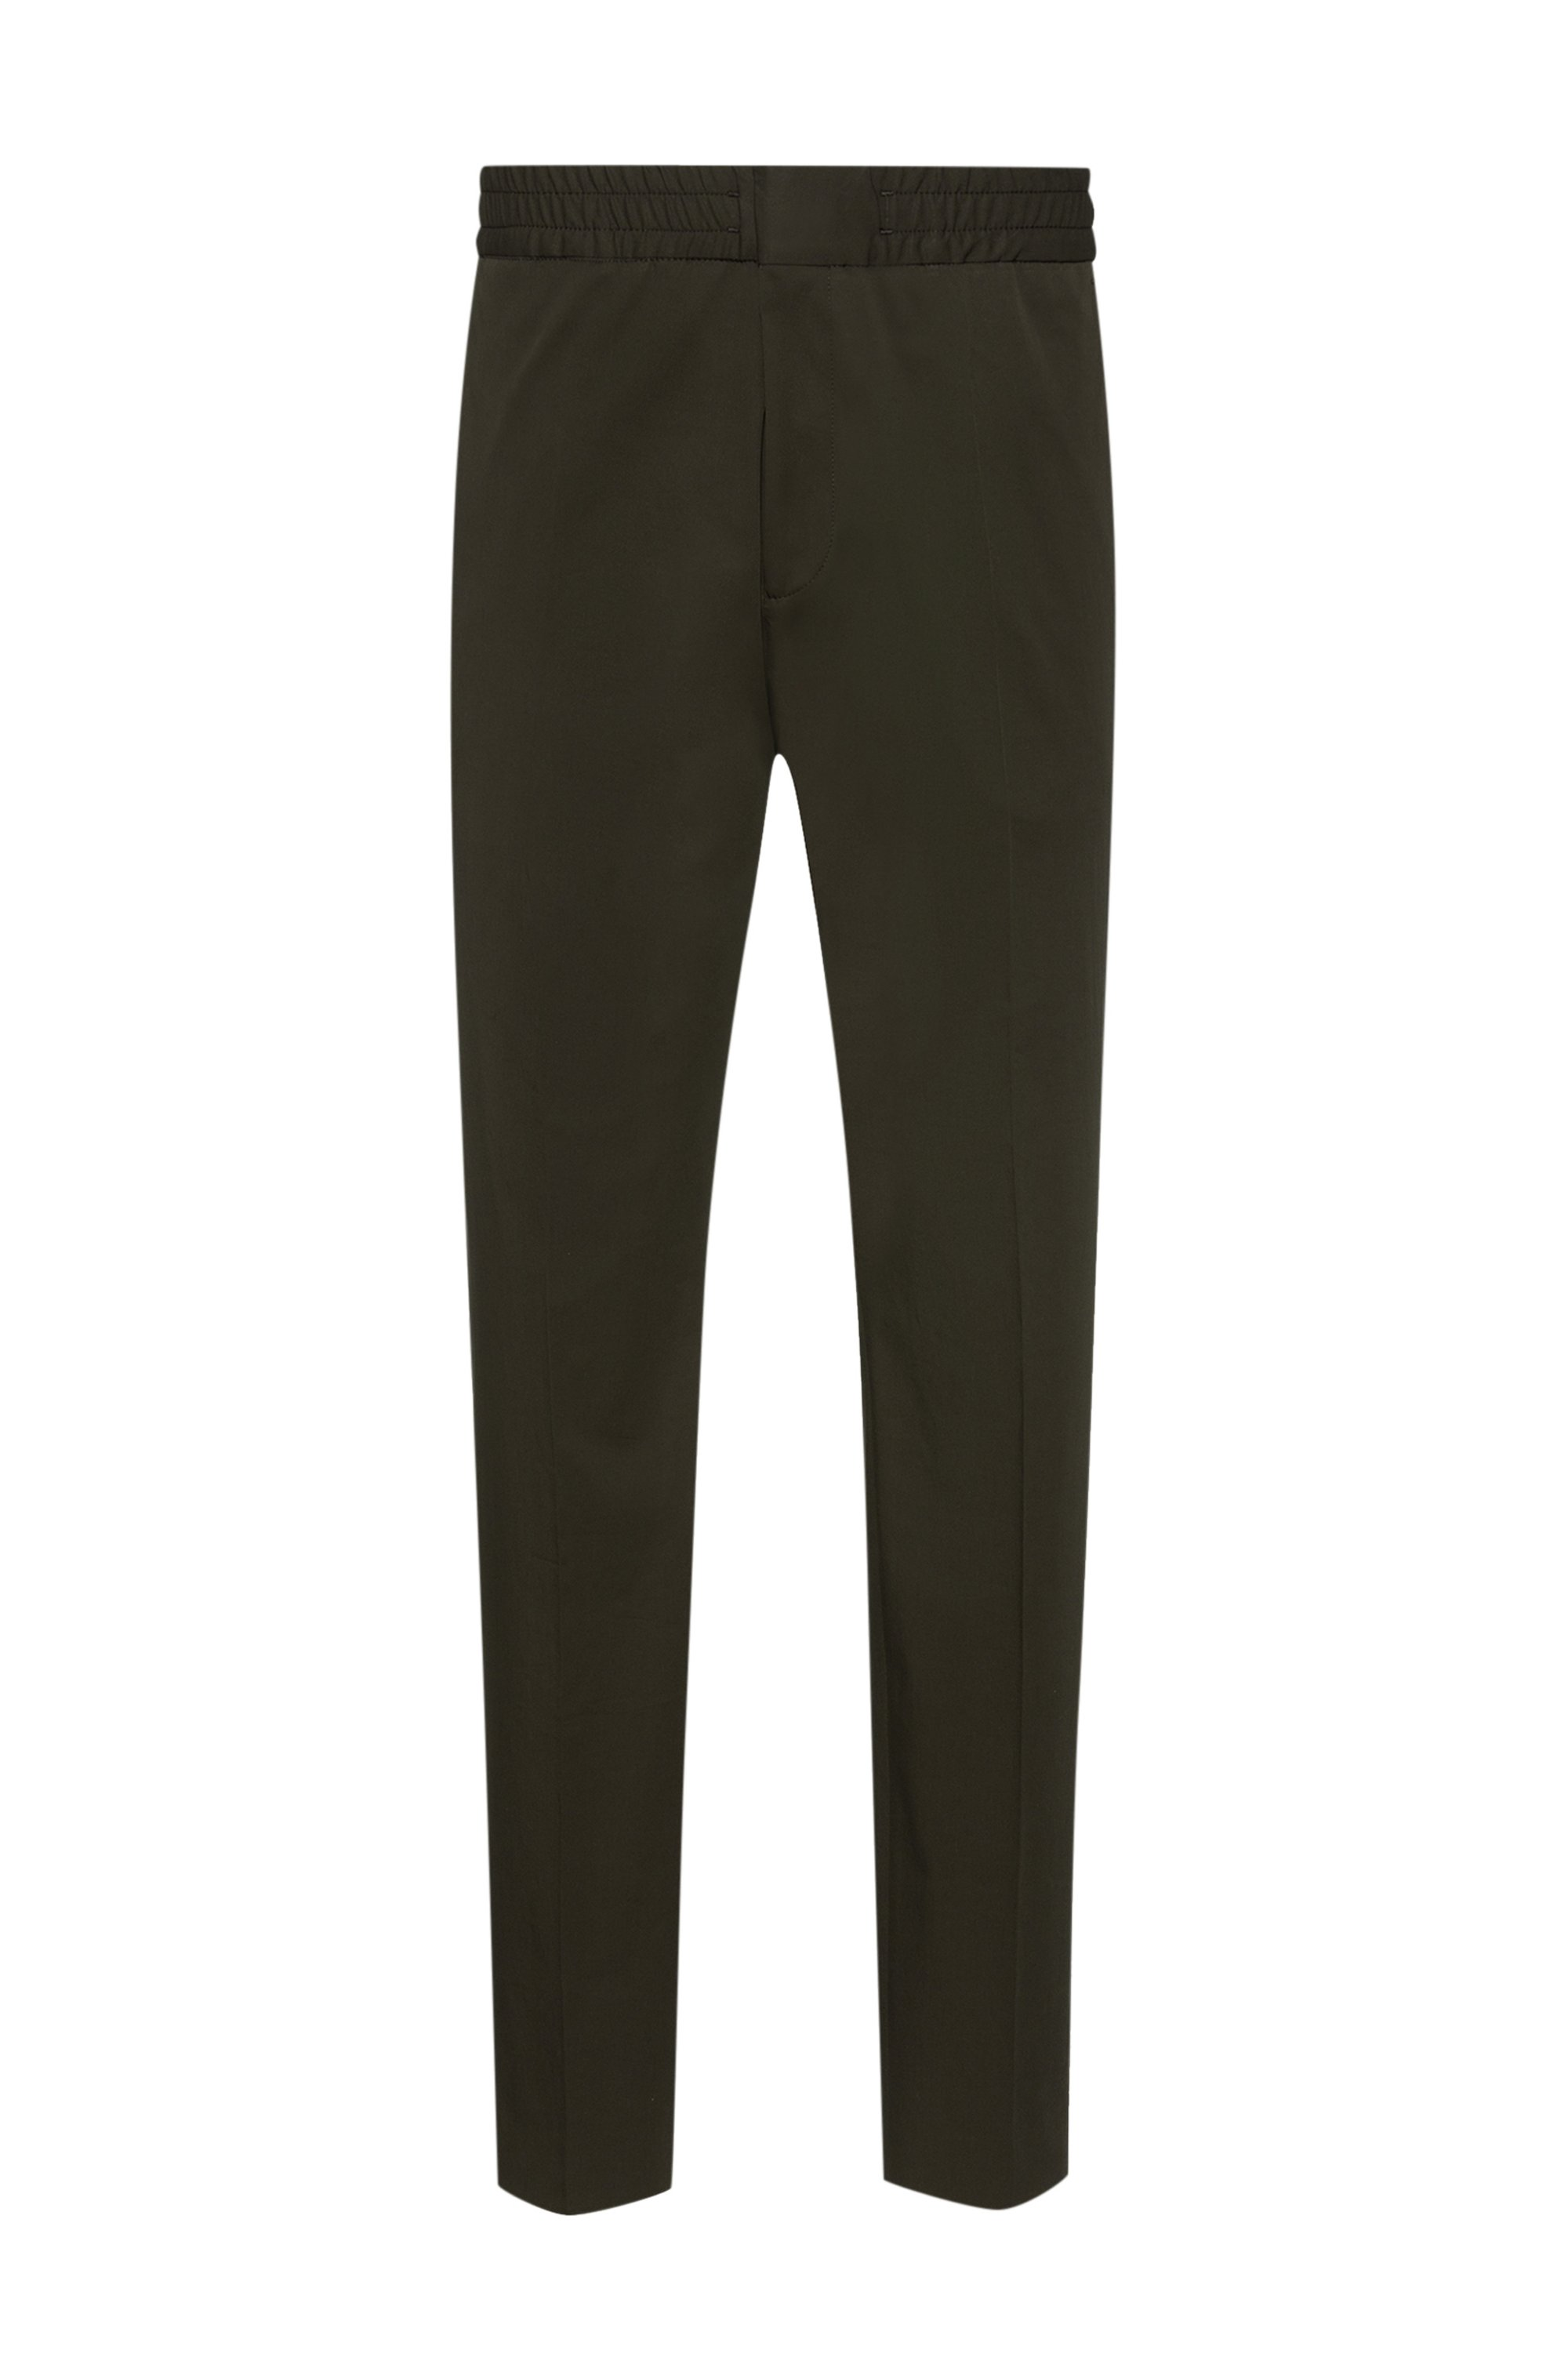 Pantalon Extra Slim Fit en tissu stretch performant, Vert sombre